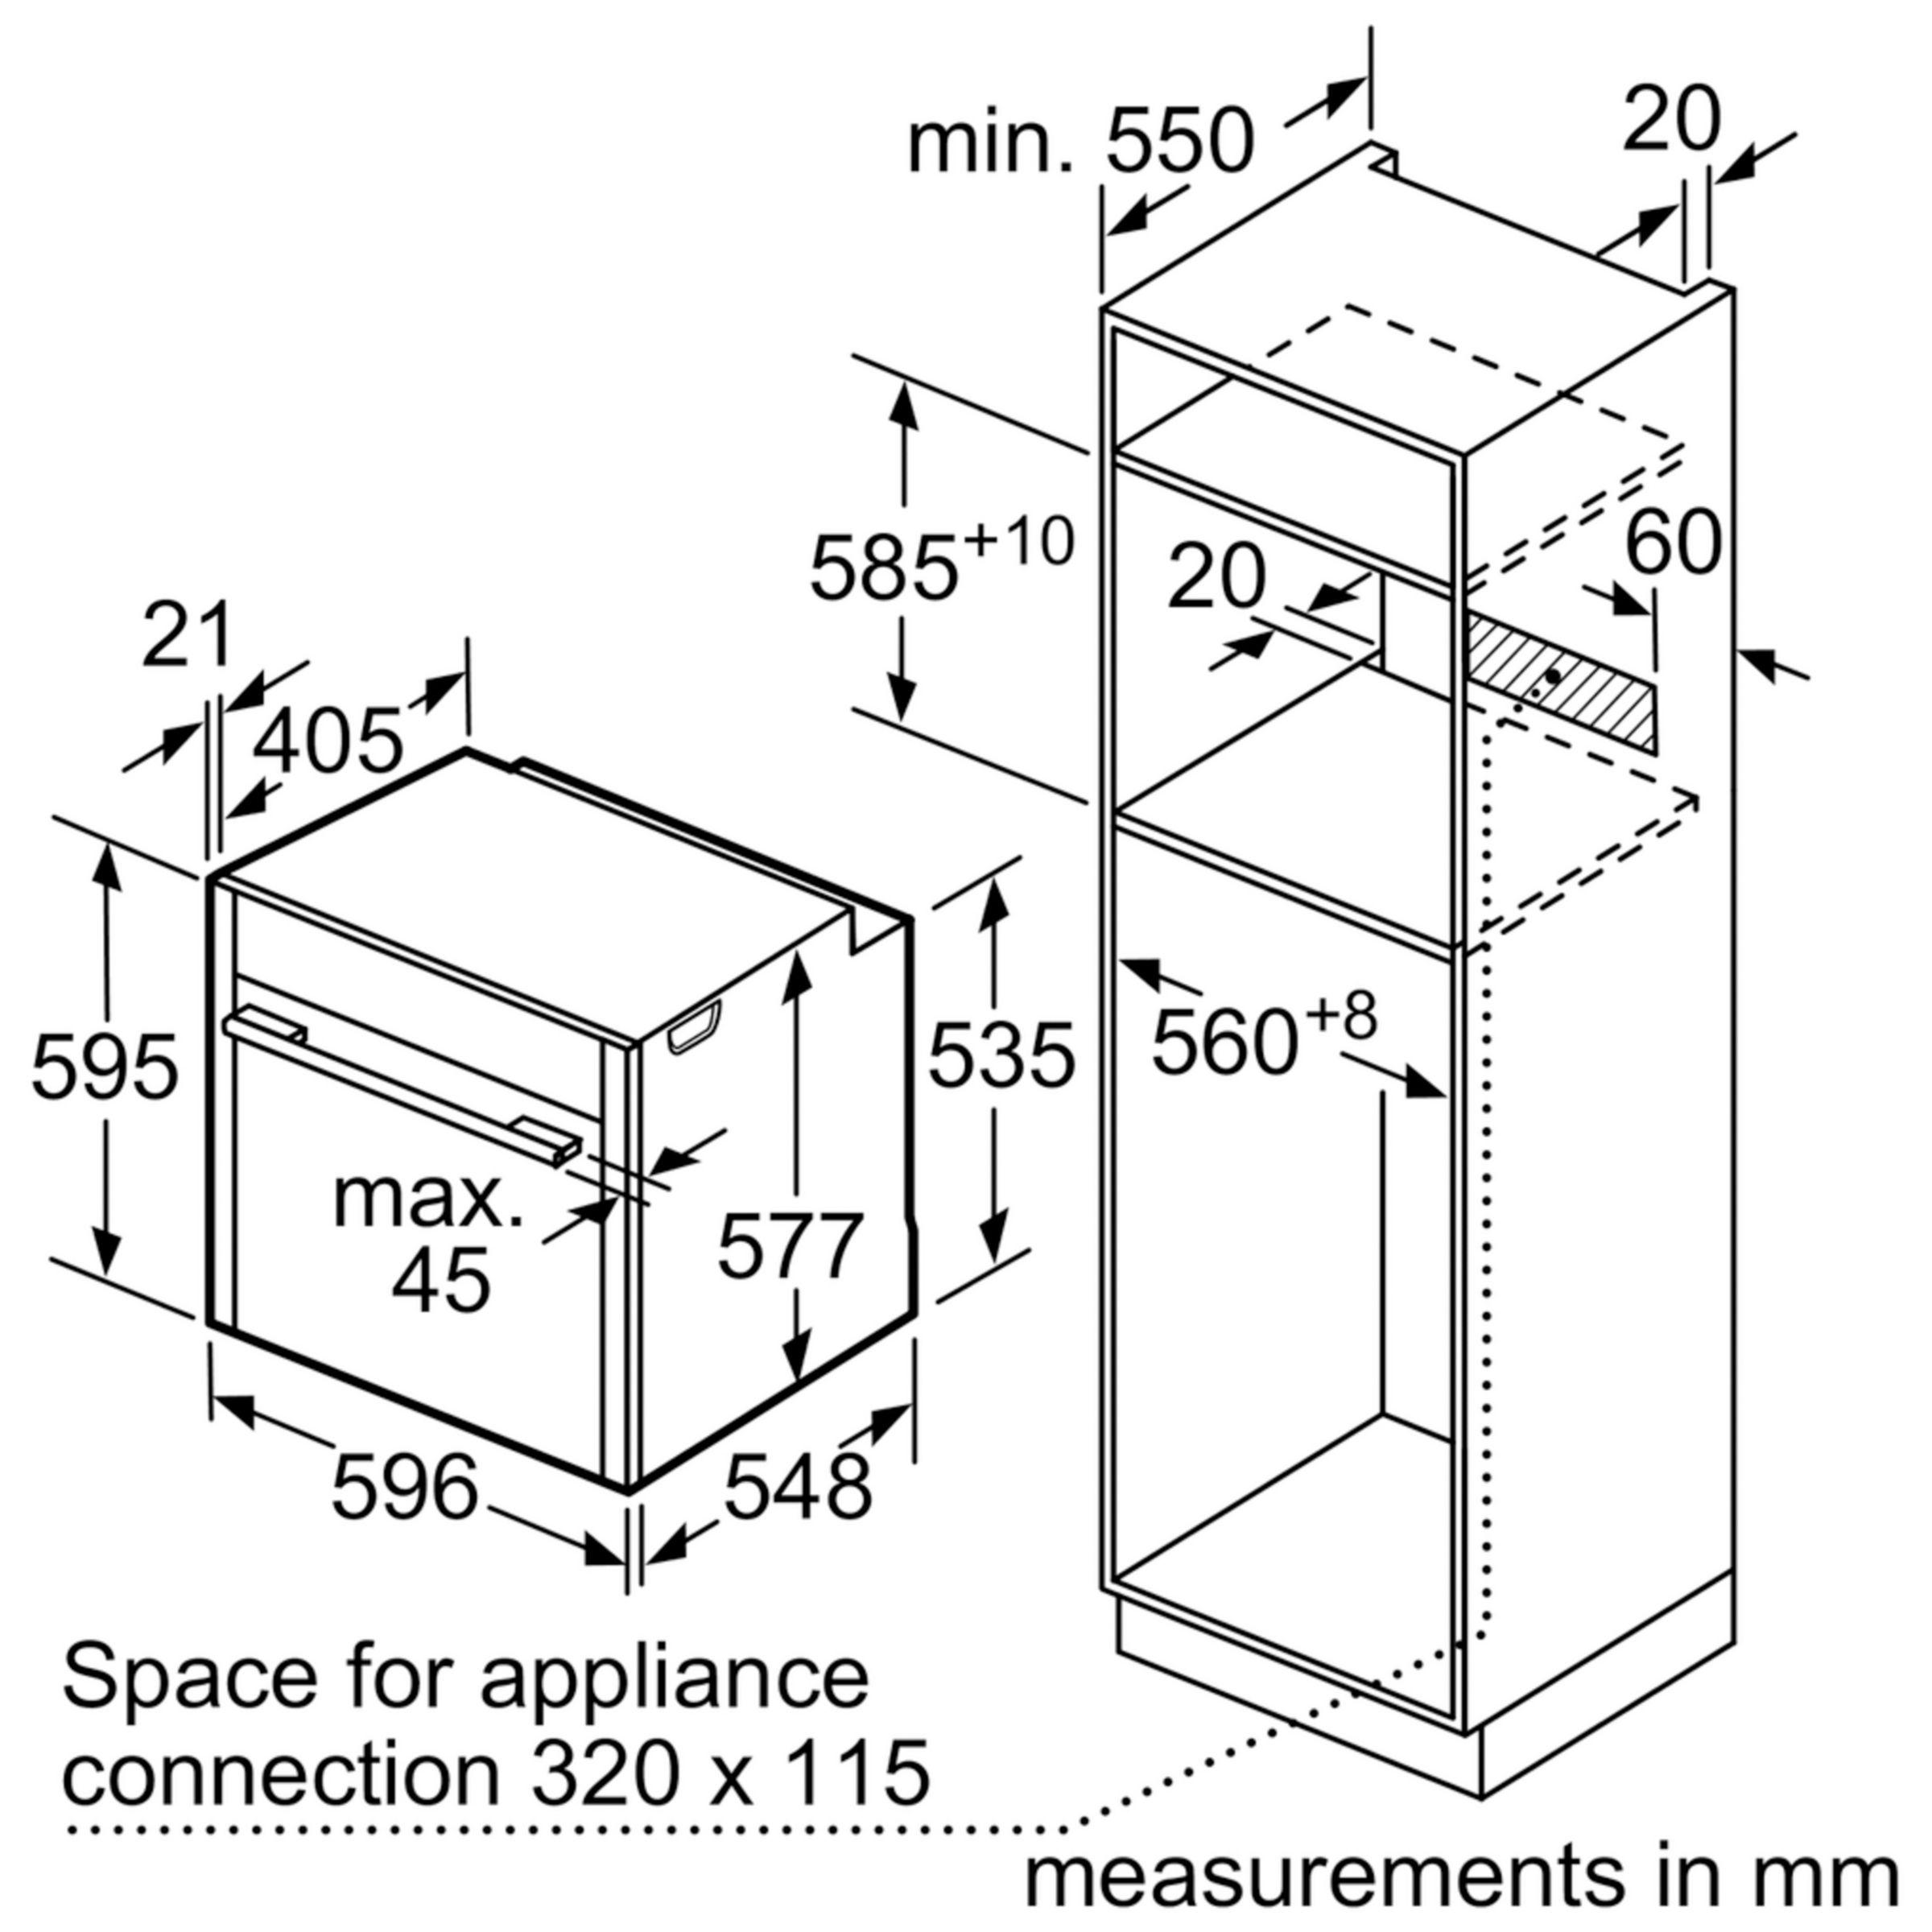 buyneff b57vr22n0b slide and hide single electric oven stainless steel online at johnlewis com  [ 1440 x 1920 Pixel ]